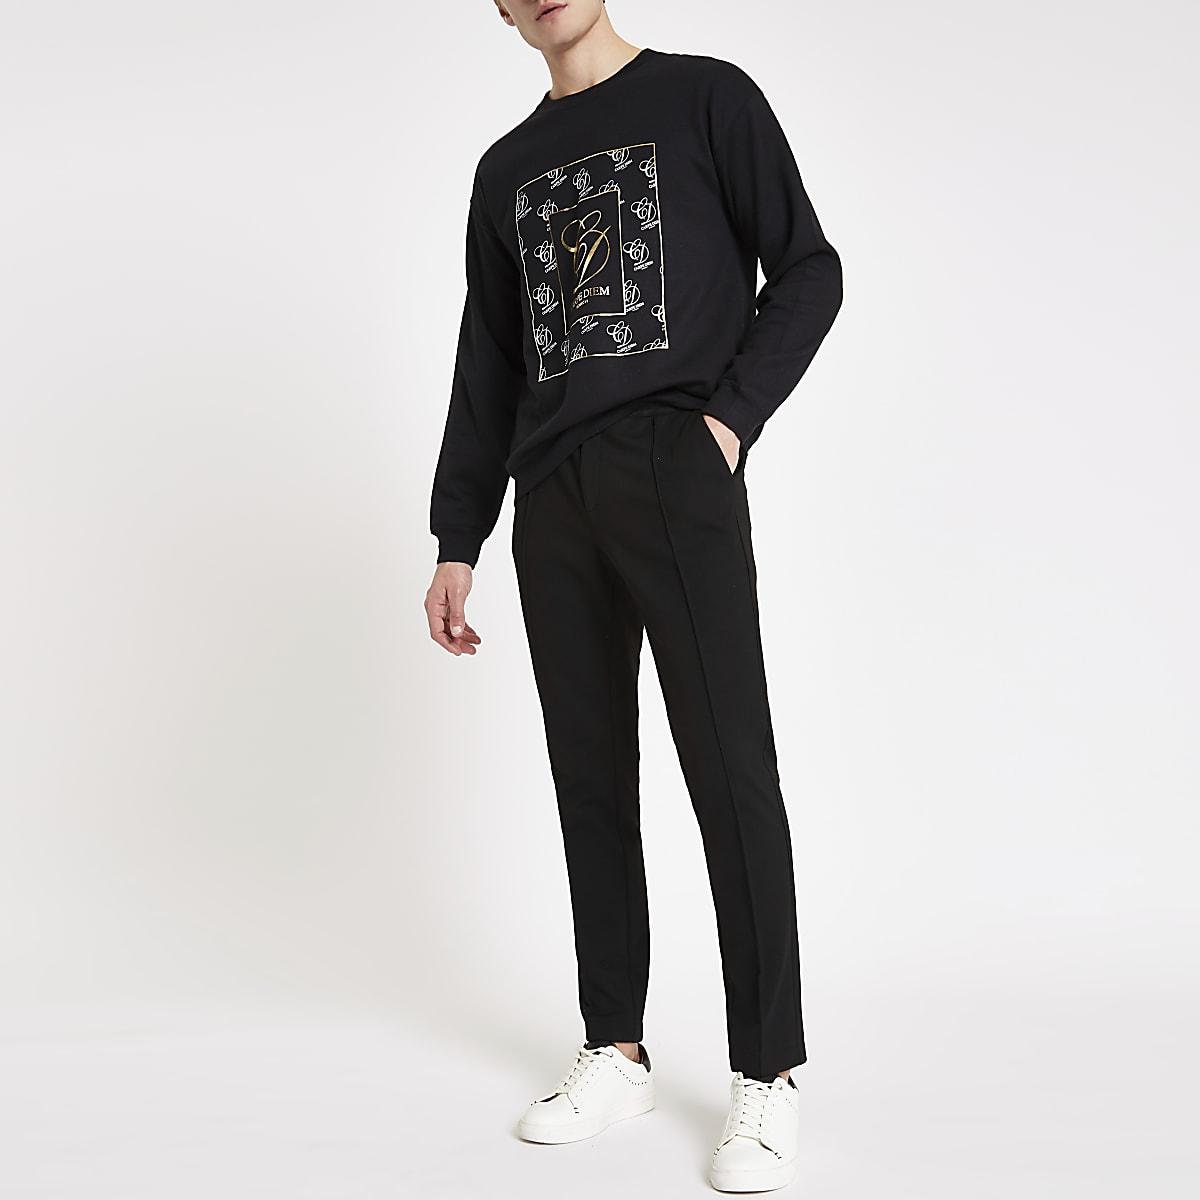 Black 'Carpe Diem' print sweatshirt